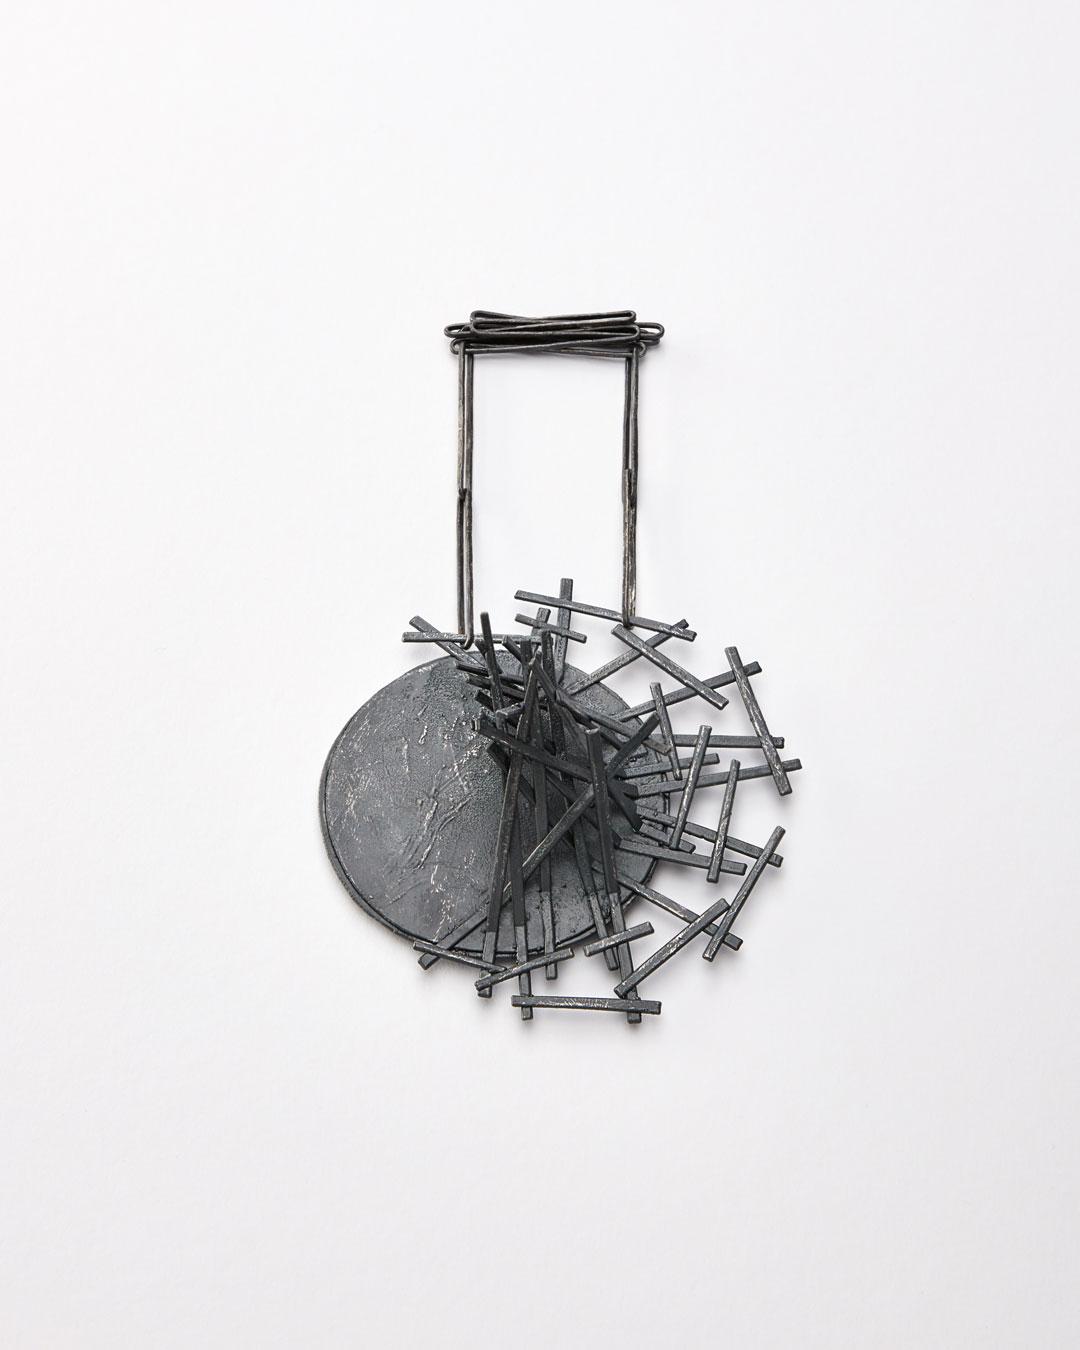 Iris Bodemer, Gegenüberstellung 5 (nevenschikking 5), 2019, hanger; zilver, thermoplast, 115 x 110 x 45 mm, €3500